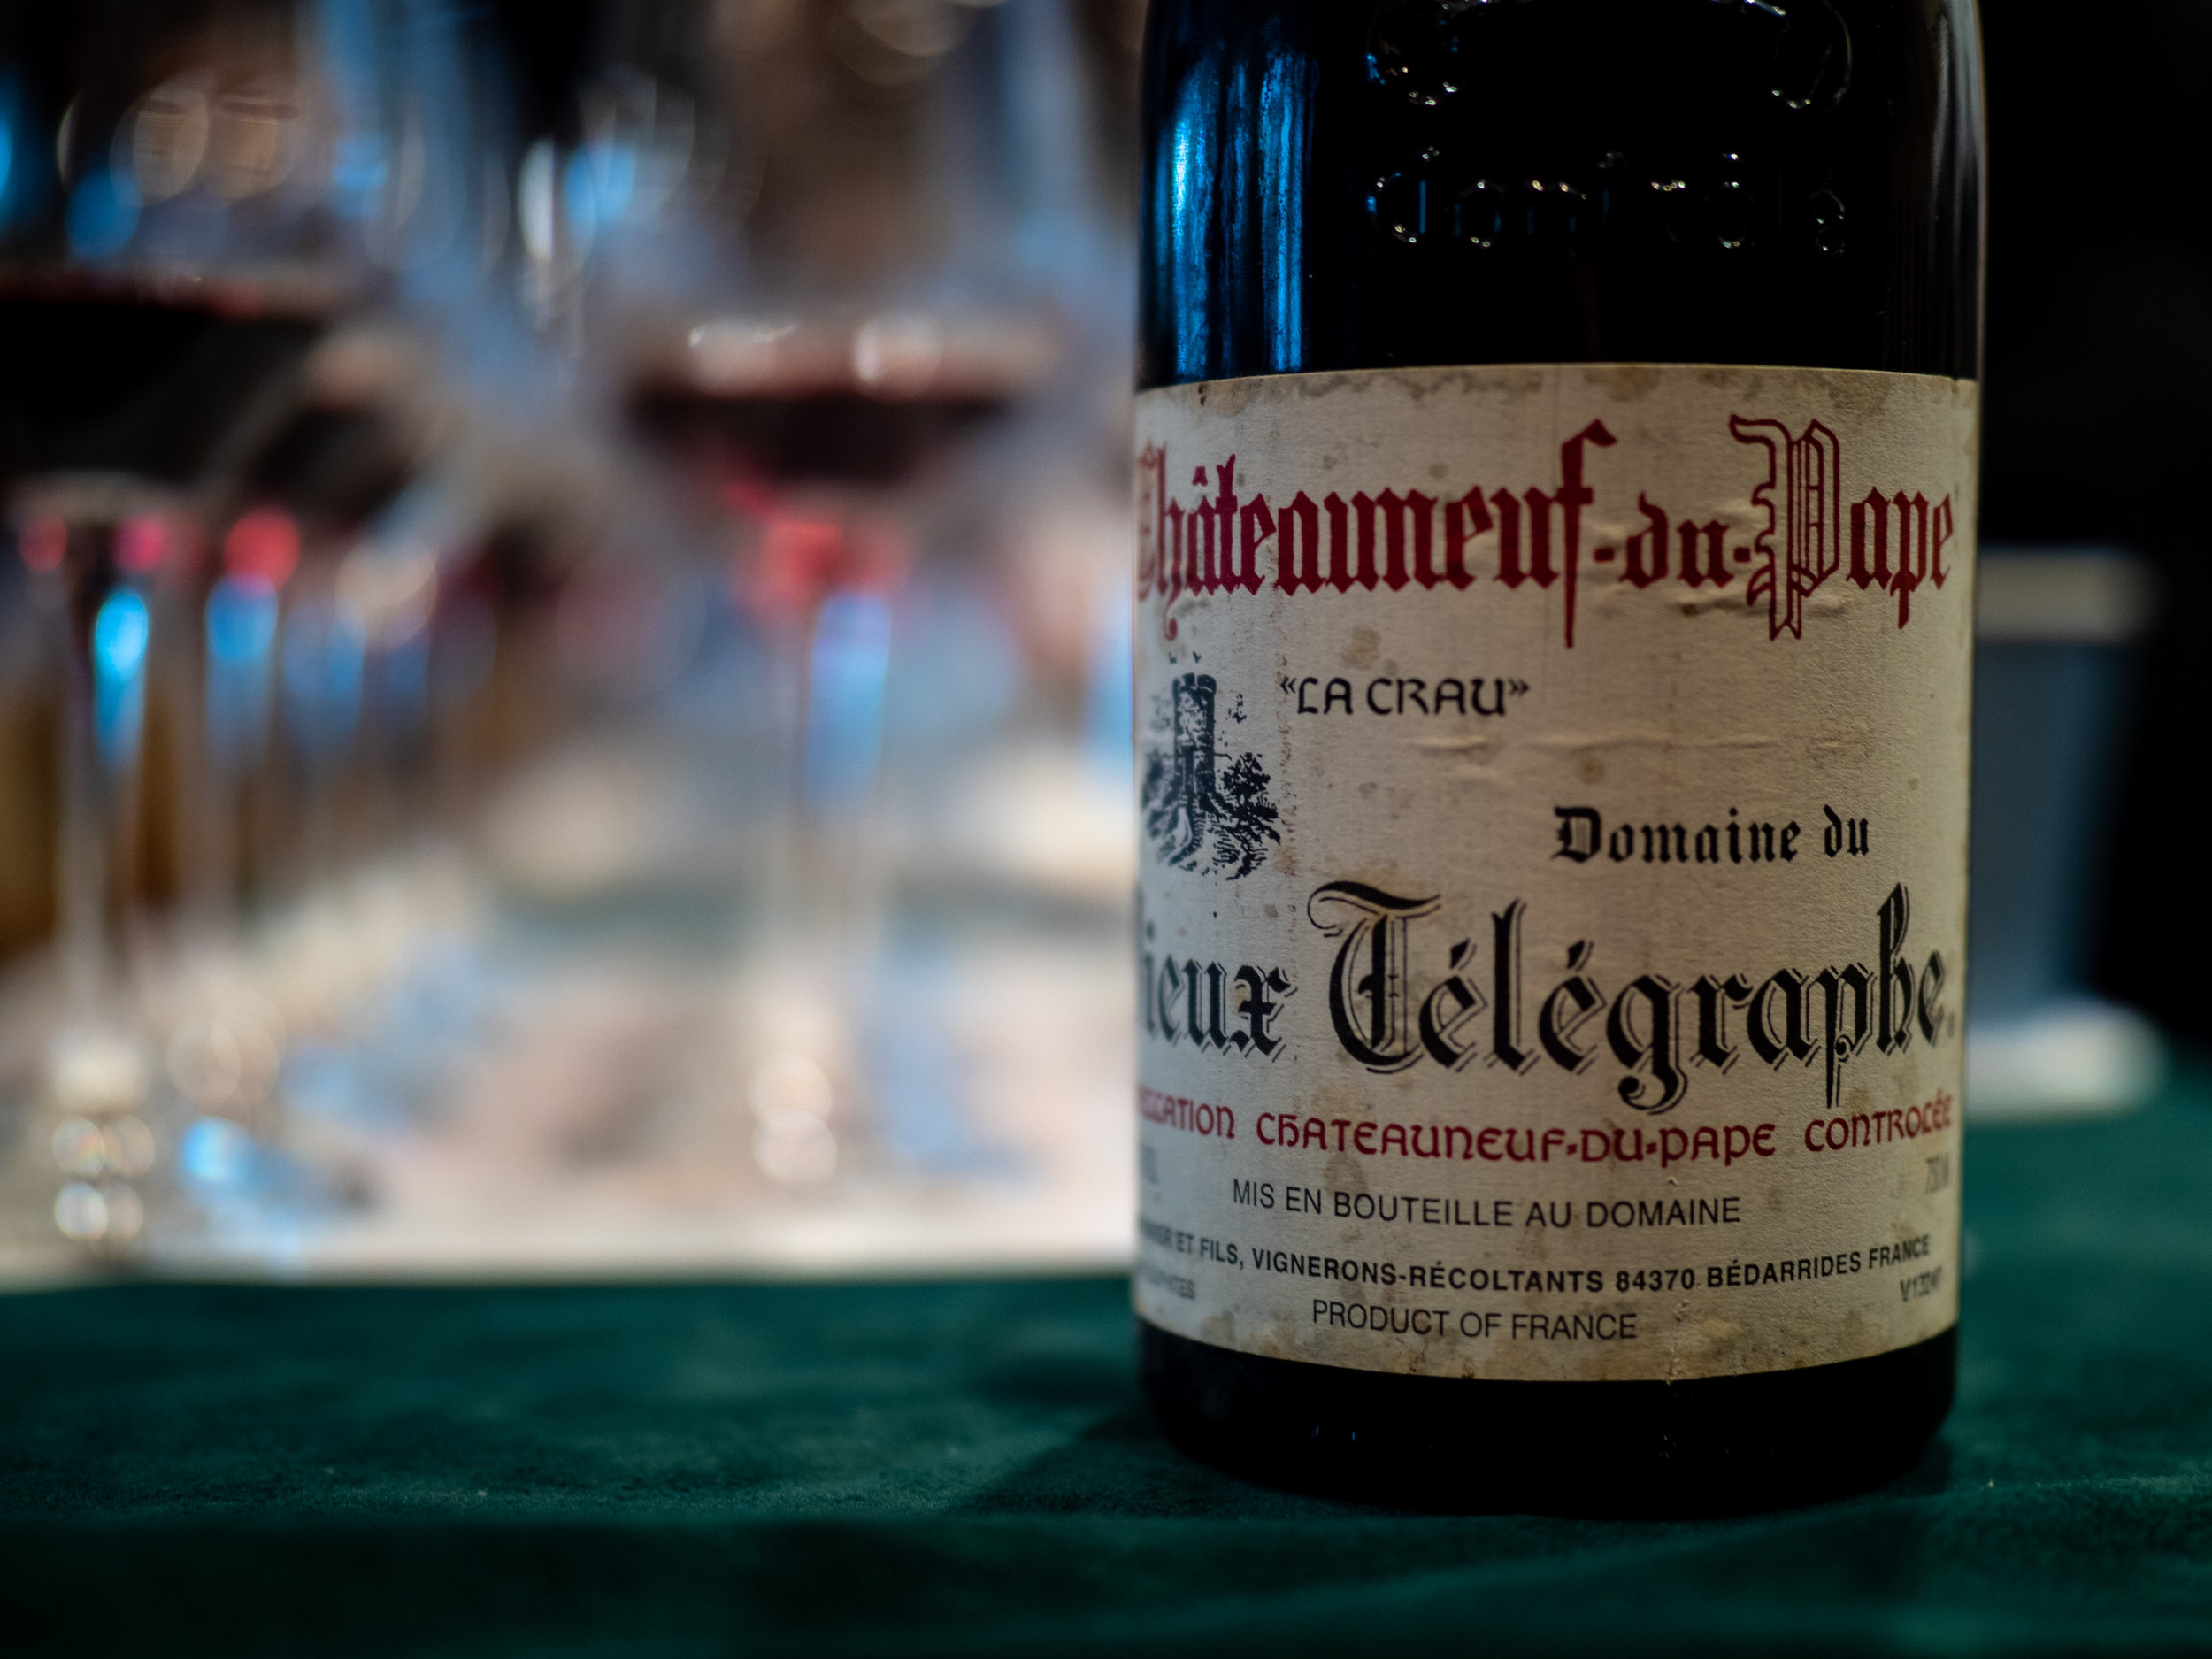 Vinous Label Elucidation - Decoding Rhone Valley Wine Lavels - Vieux Telegraphe from Chateauneuf-du-Pape